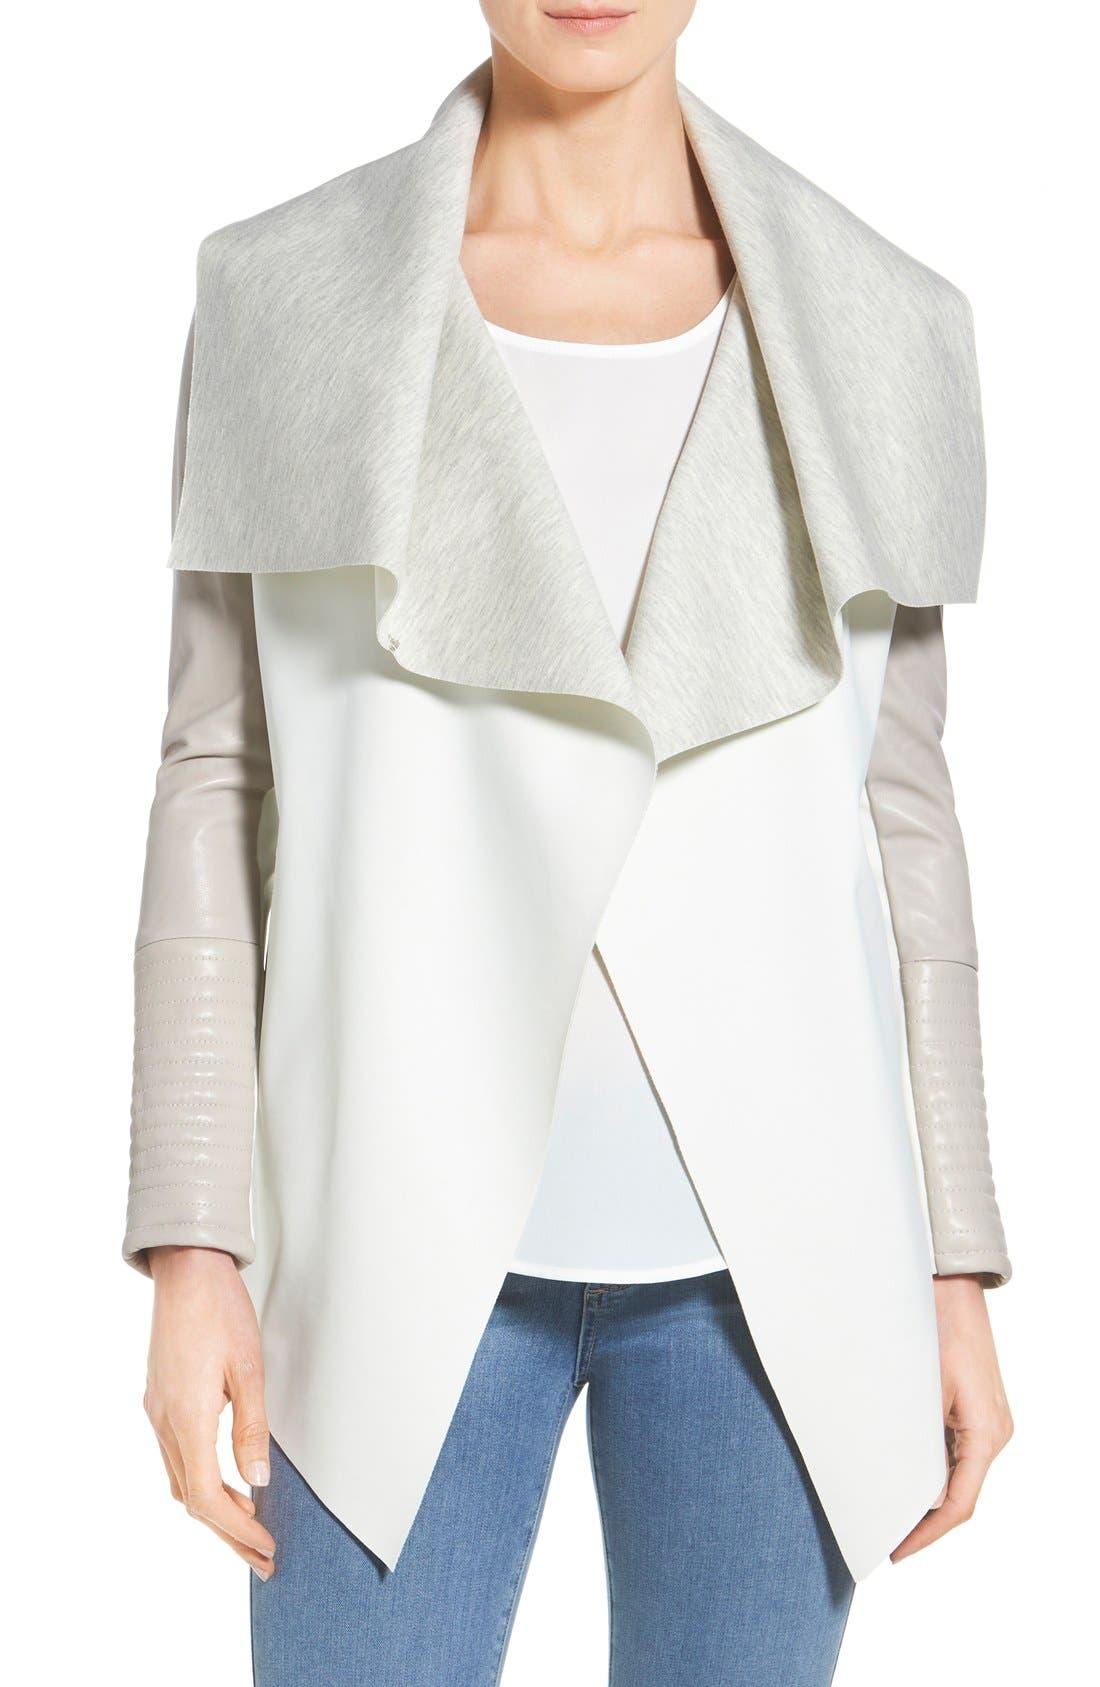 Alternate Image 1 Selected - Rudsak 'Lamony' Leather Sleeve Neoprene Drape Collar Jacket